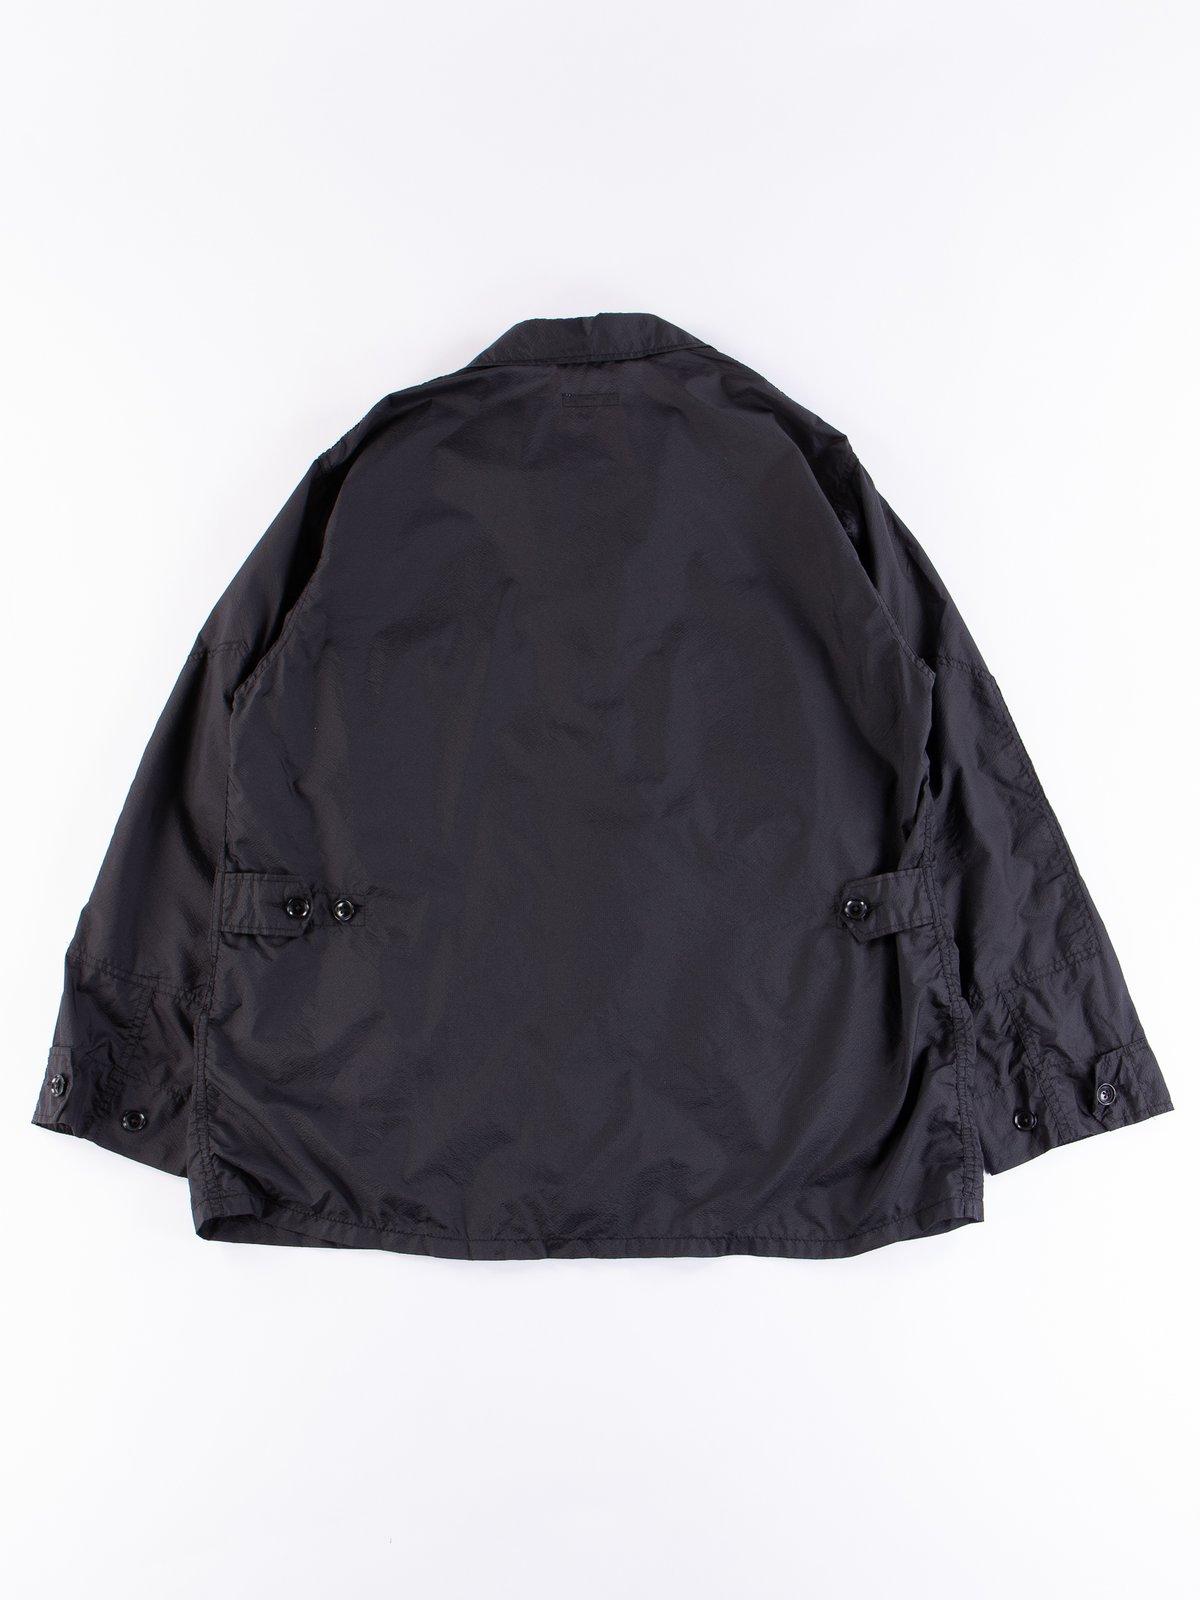 Black Nylon Micro Ripstop BDU Jacket - Image 5